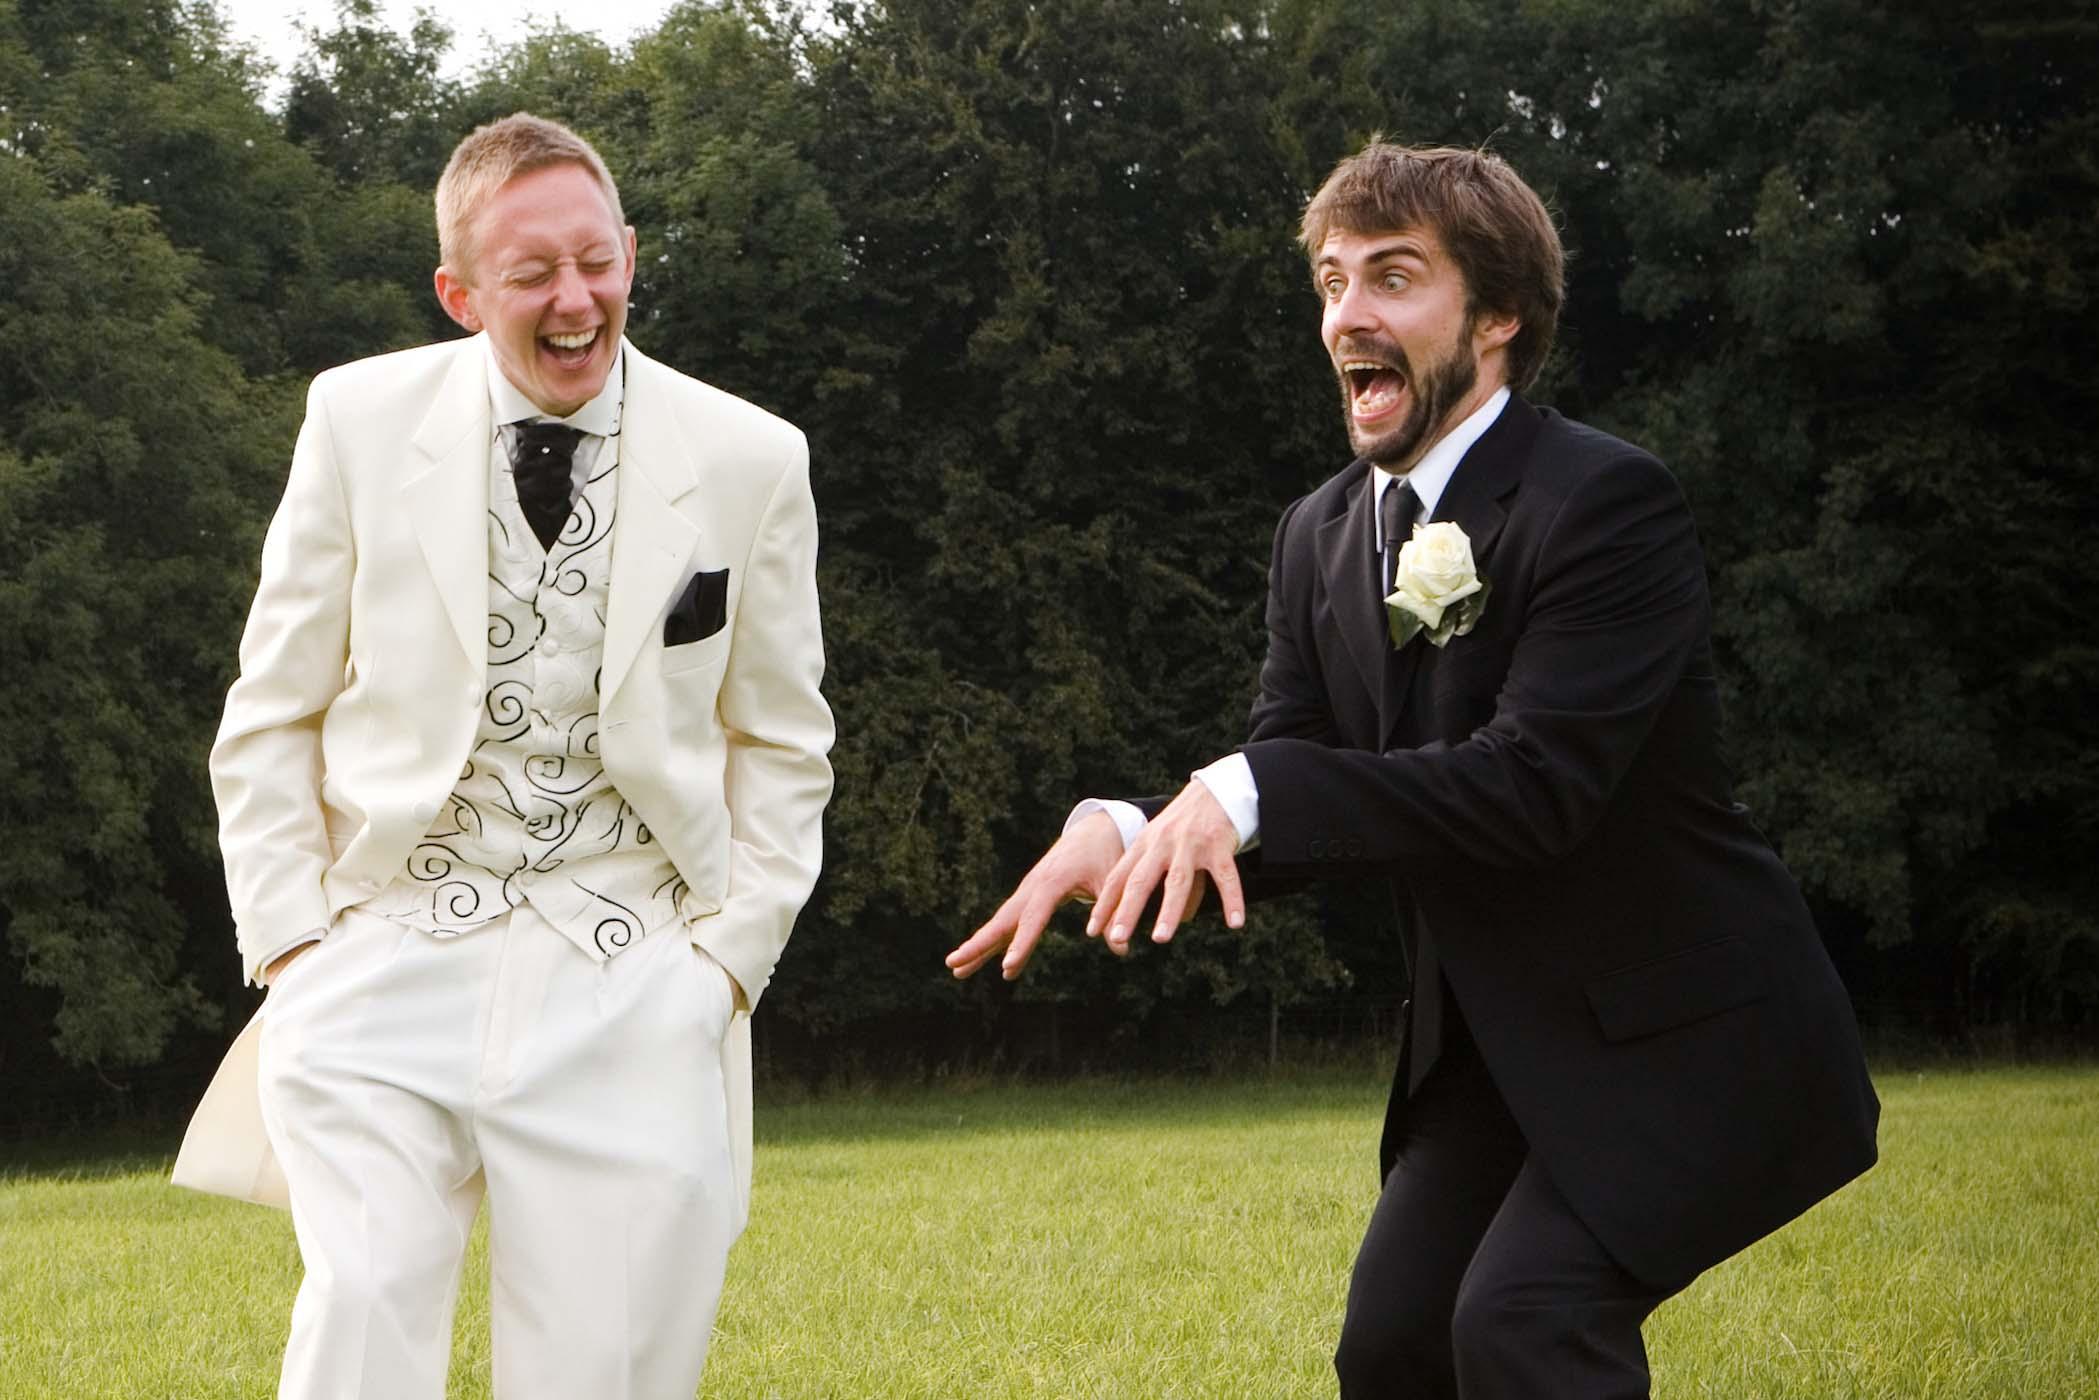 dan_burman_wedding_photography (29).jpg